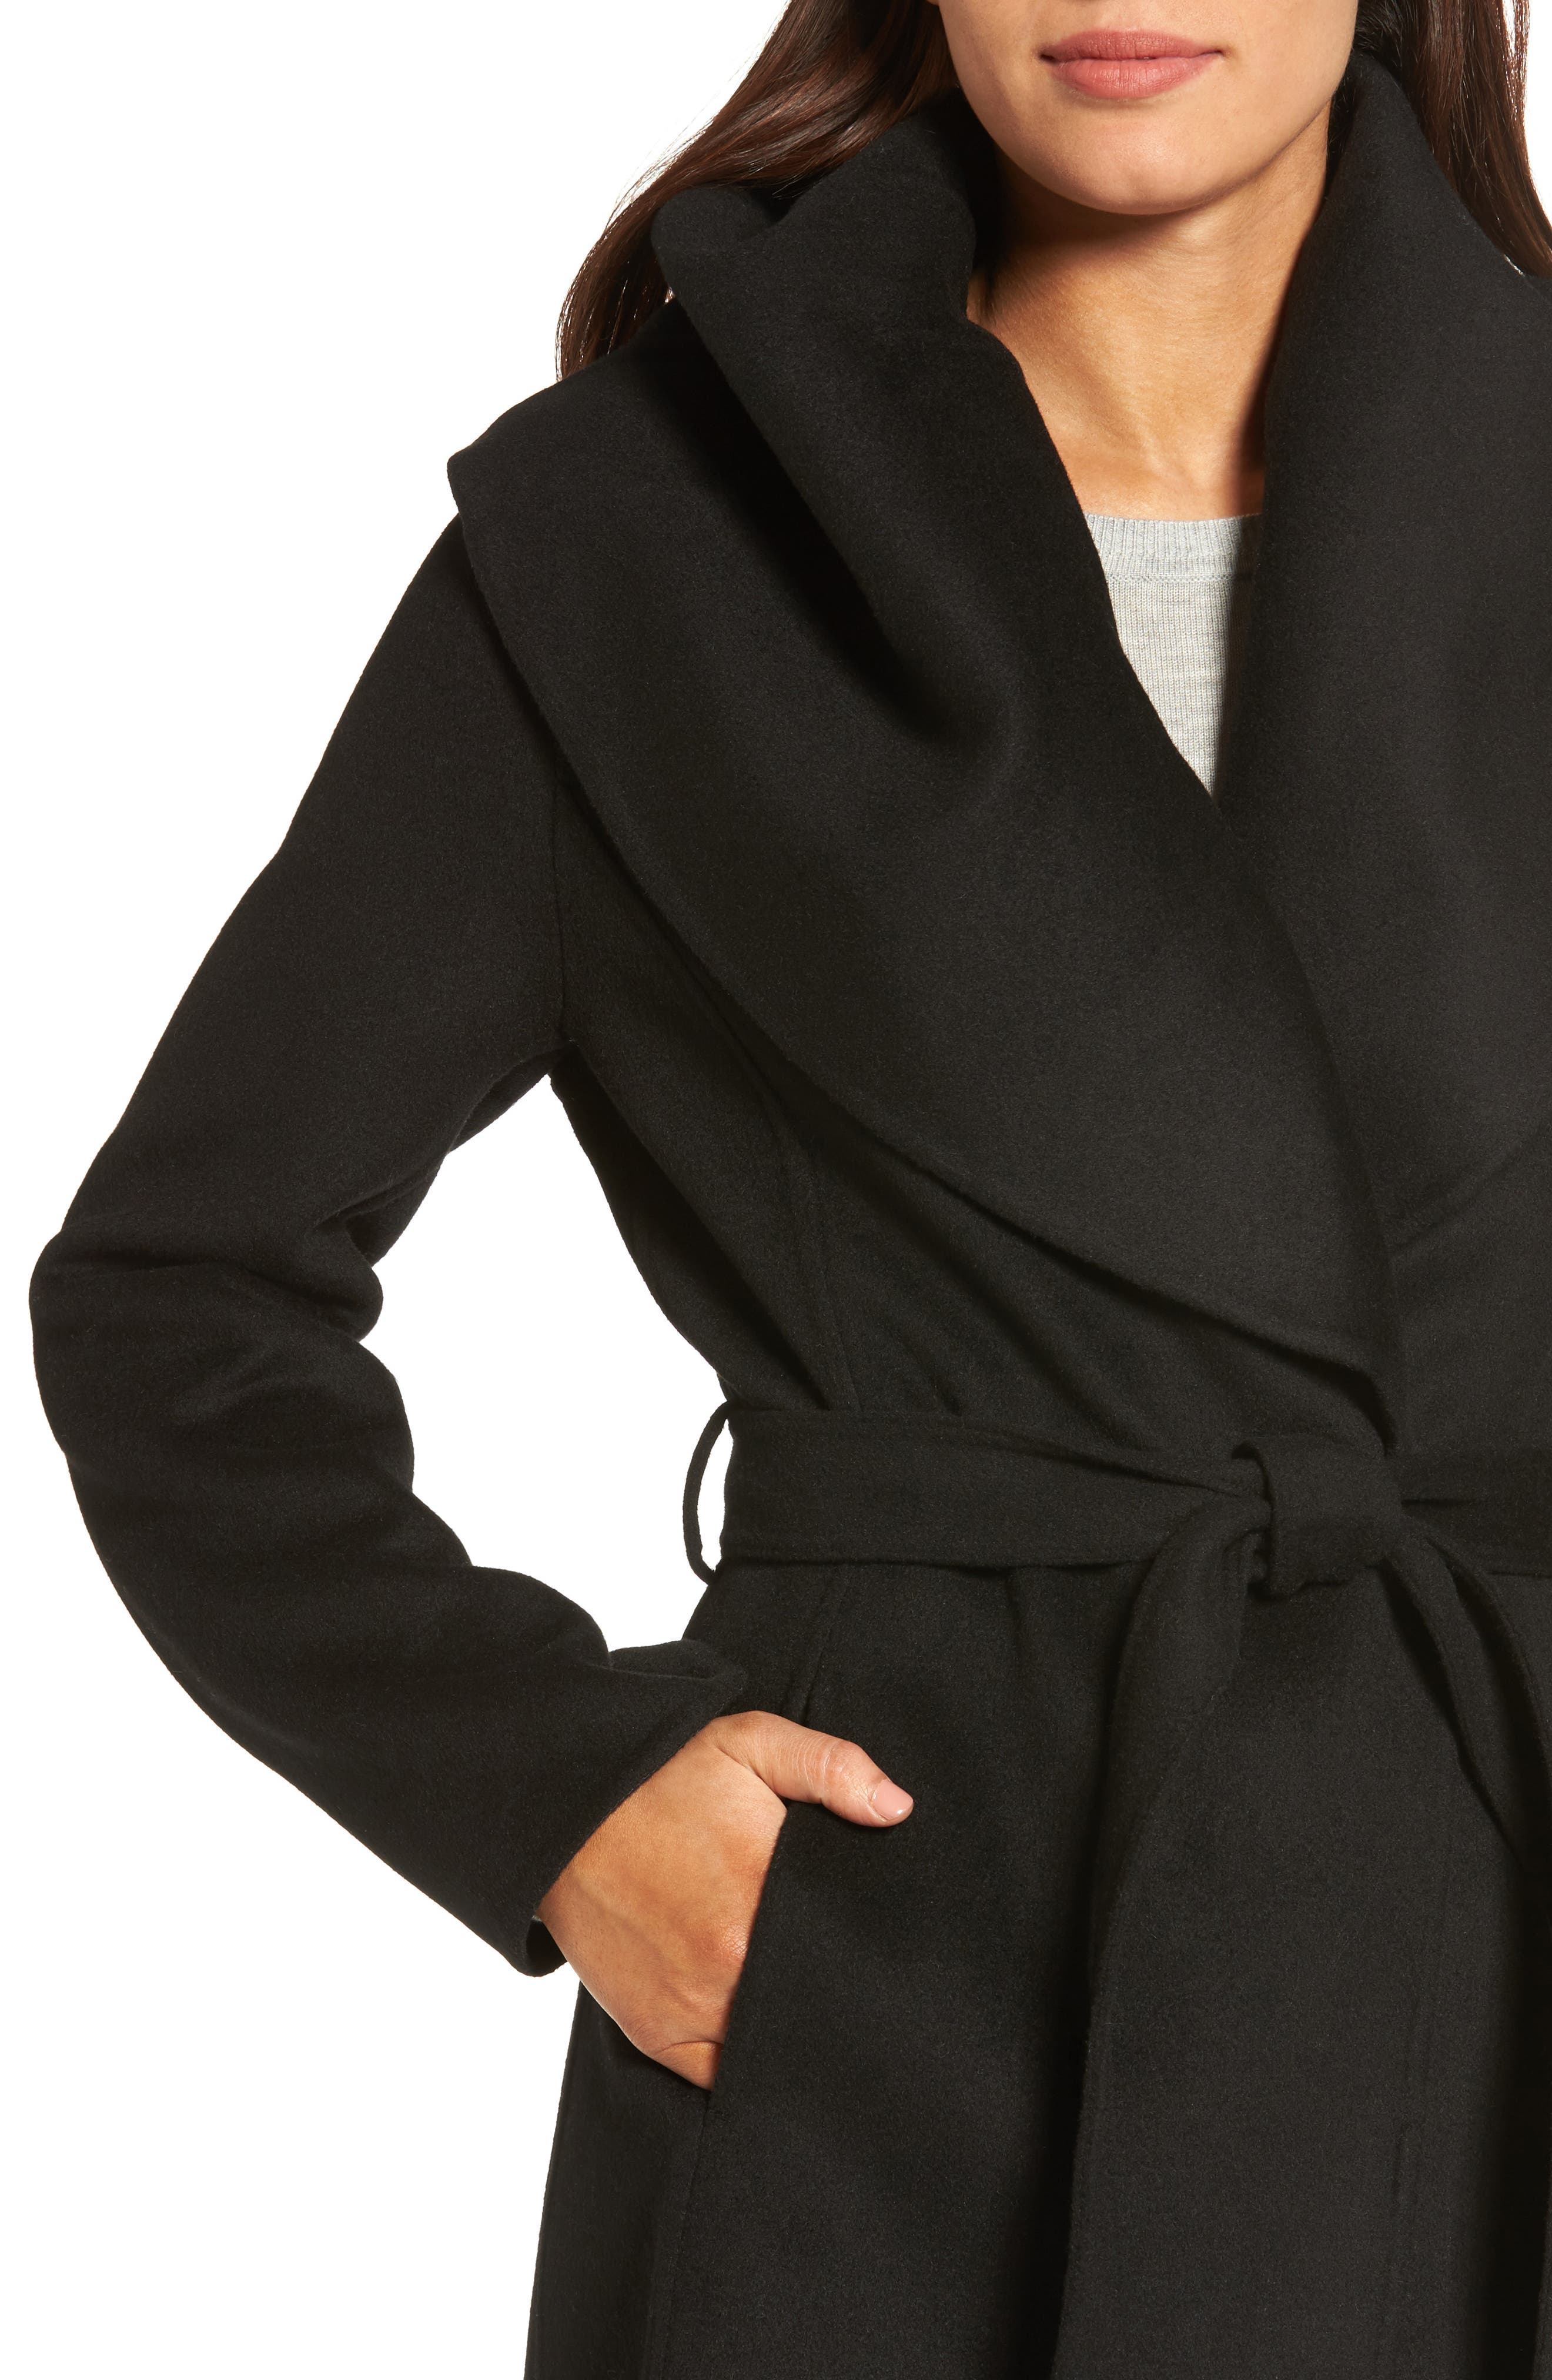 Marla Double Face Wool Blend Wrap Coat,                             Alternate thumbnail 4, color,                             001